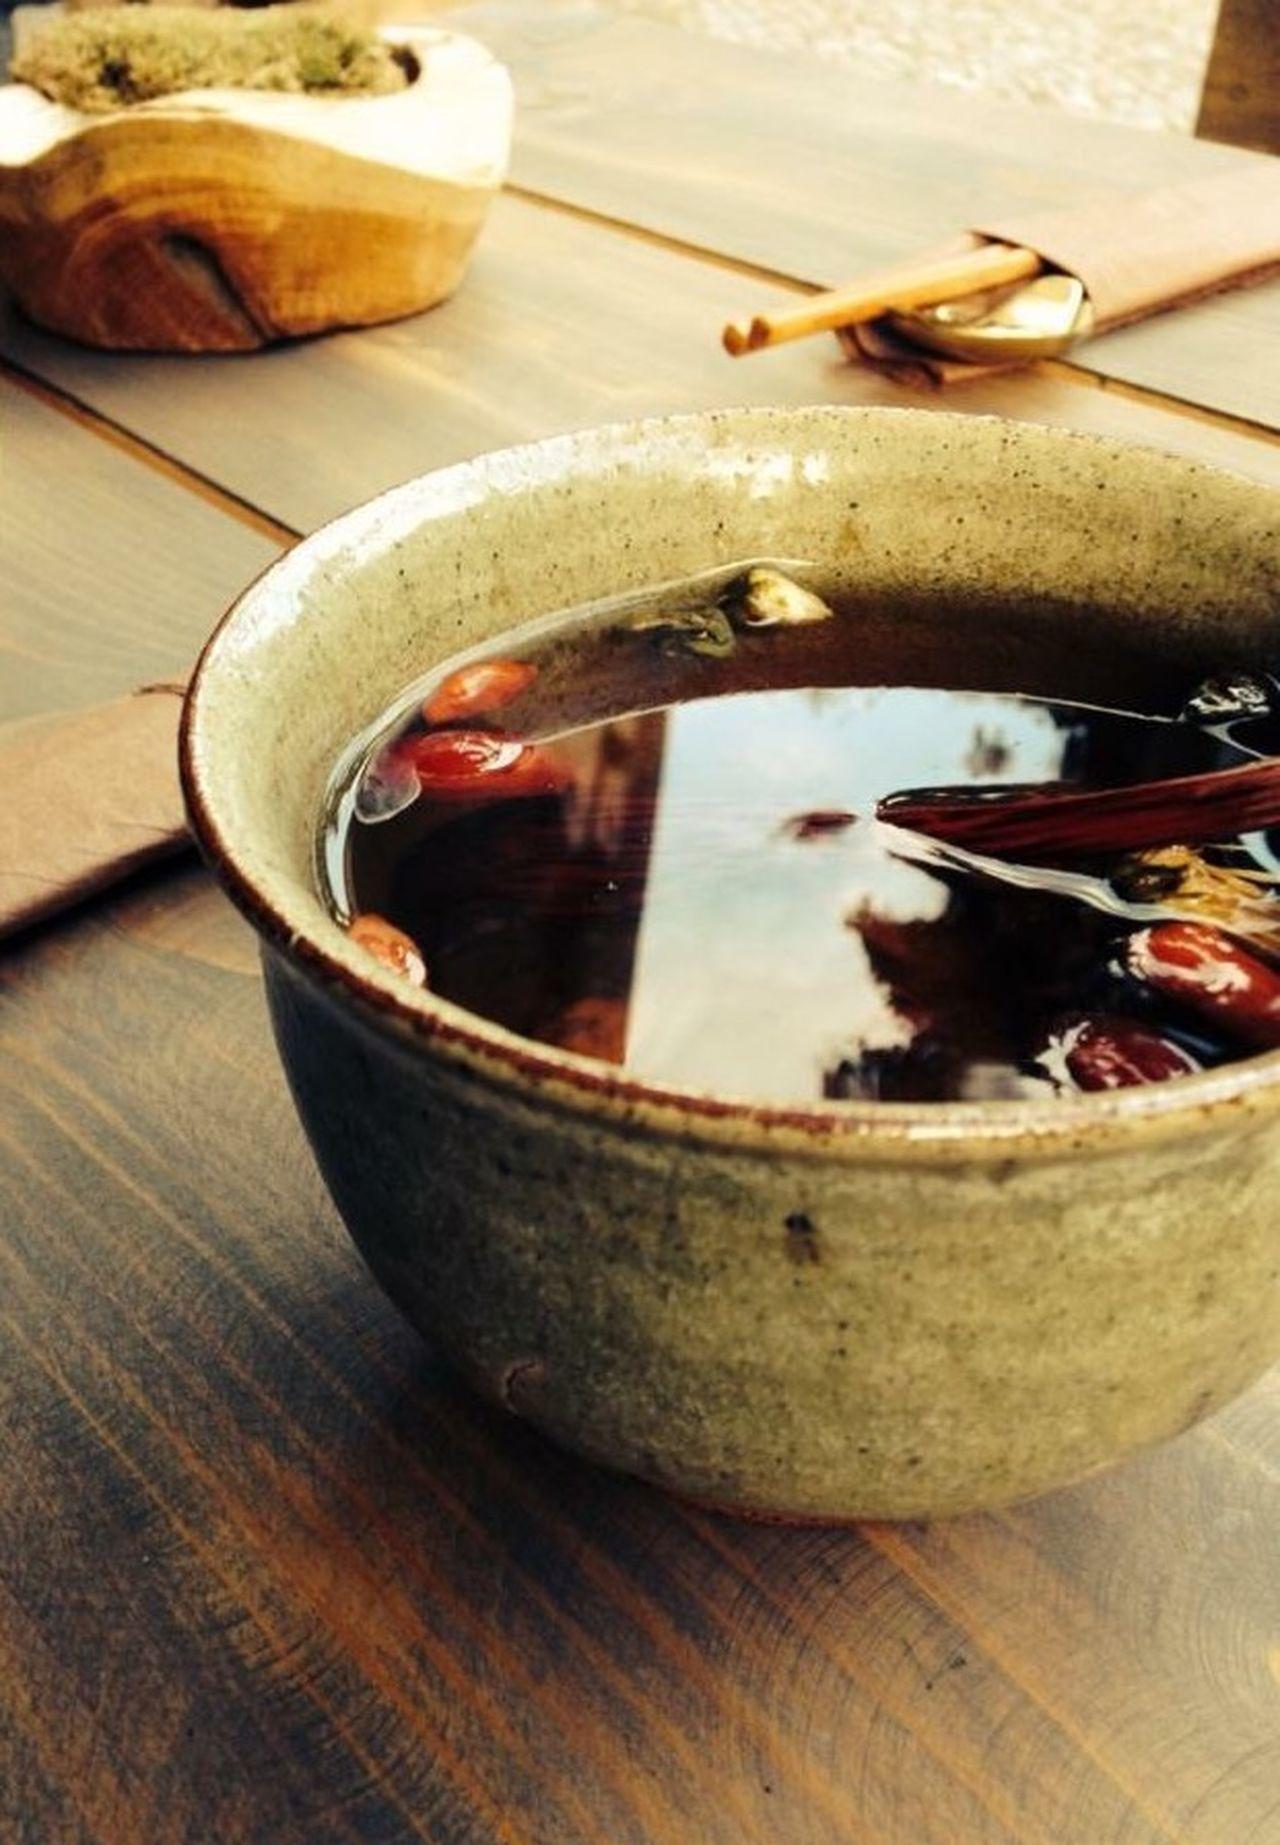 Tea Tea Time Wooden Table Clay Cup Autumn Rose Tea Still Life